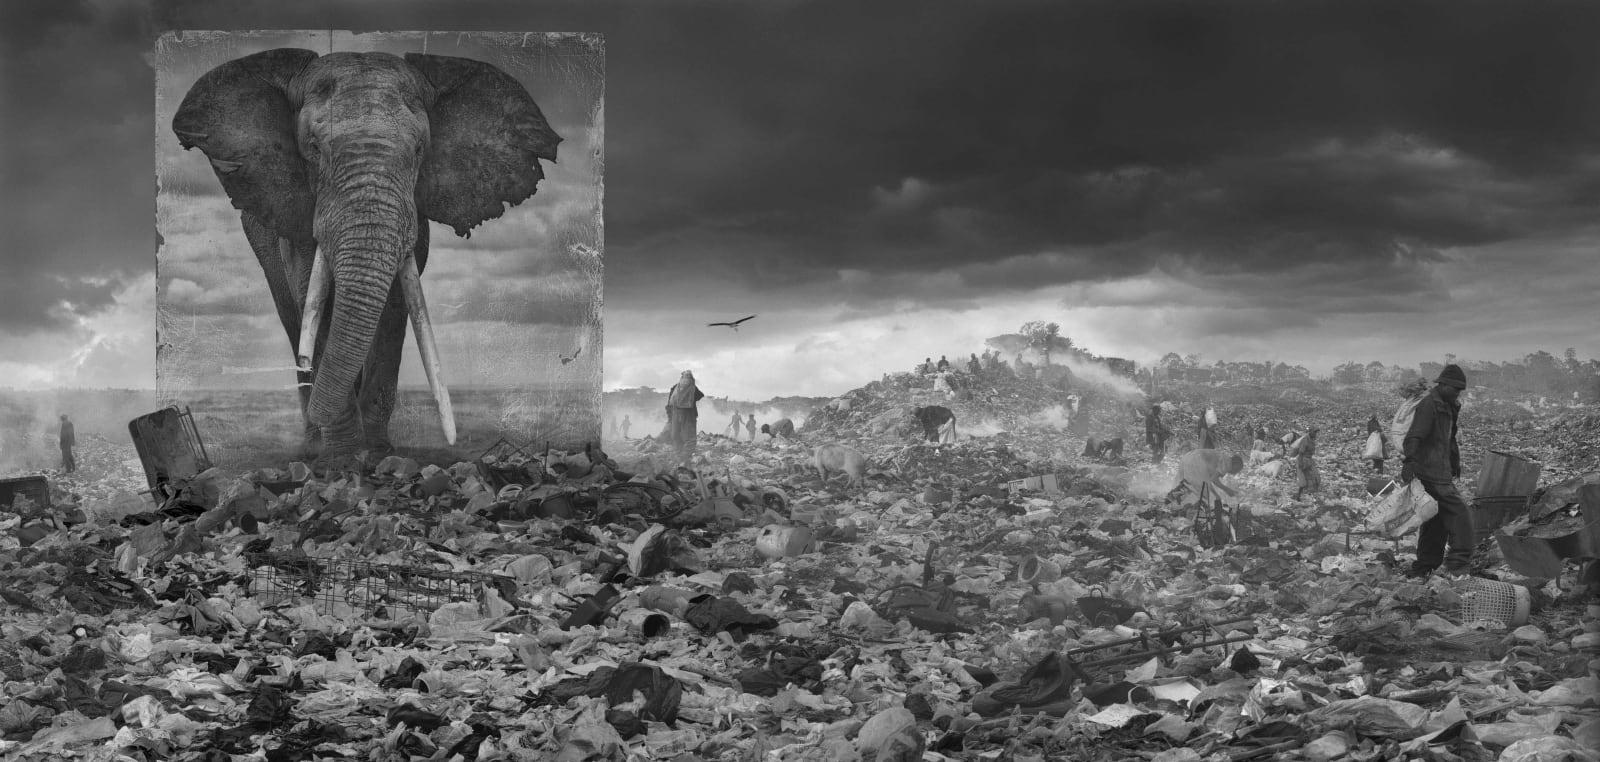 Nick Brandt, Wasteland with Elephant, 2015